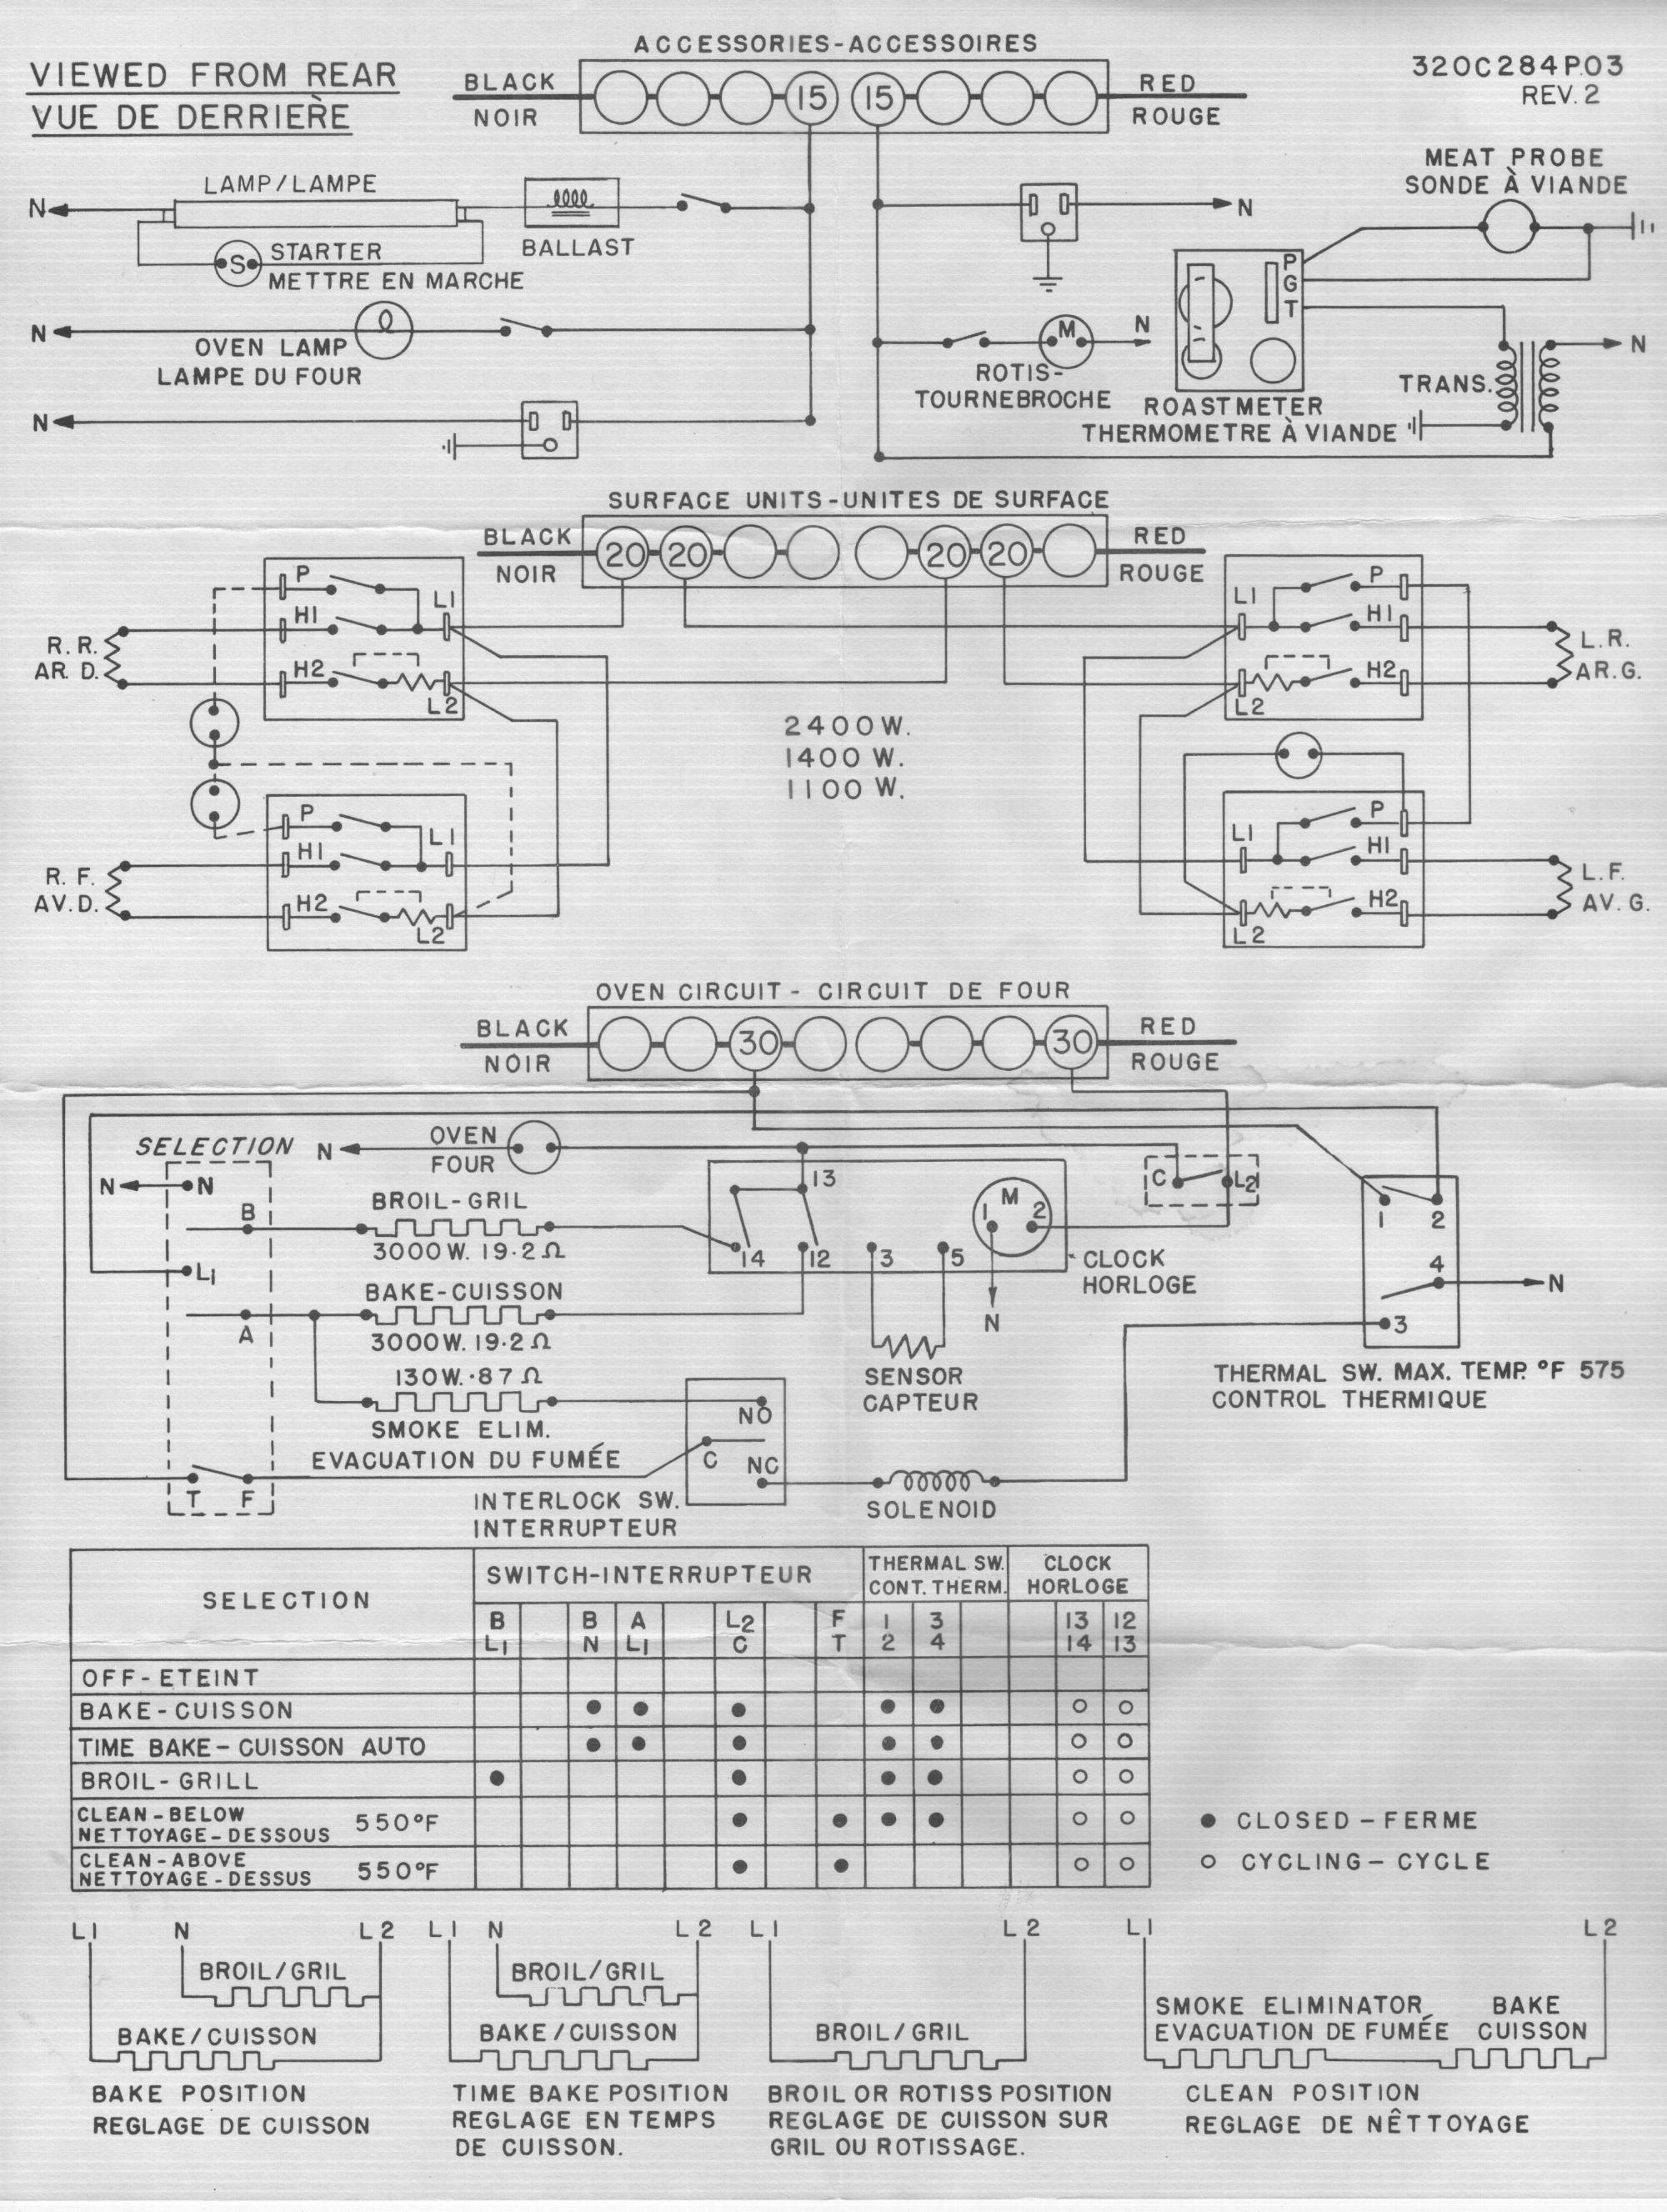 TT_1727] Electric Range Wiring Diagram View Diagram Ge Range Wiring Diagram  Wiring Diagram   Ge Gas Oven Wiring Diagram      Xtern Knie Umng Batt Reda Exmet Mohammedshrine Librar Wiring 101